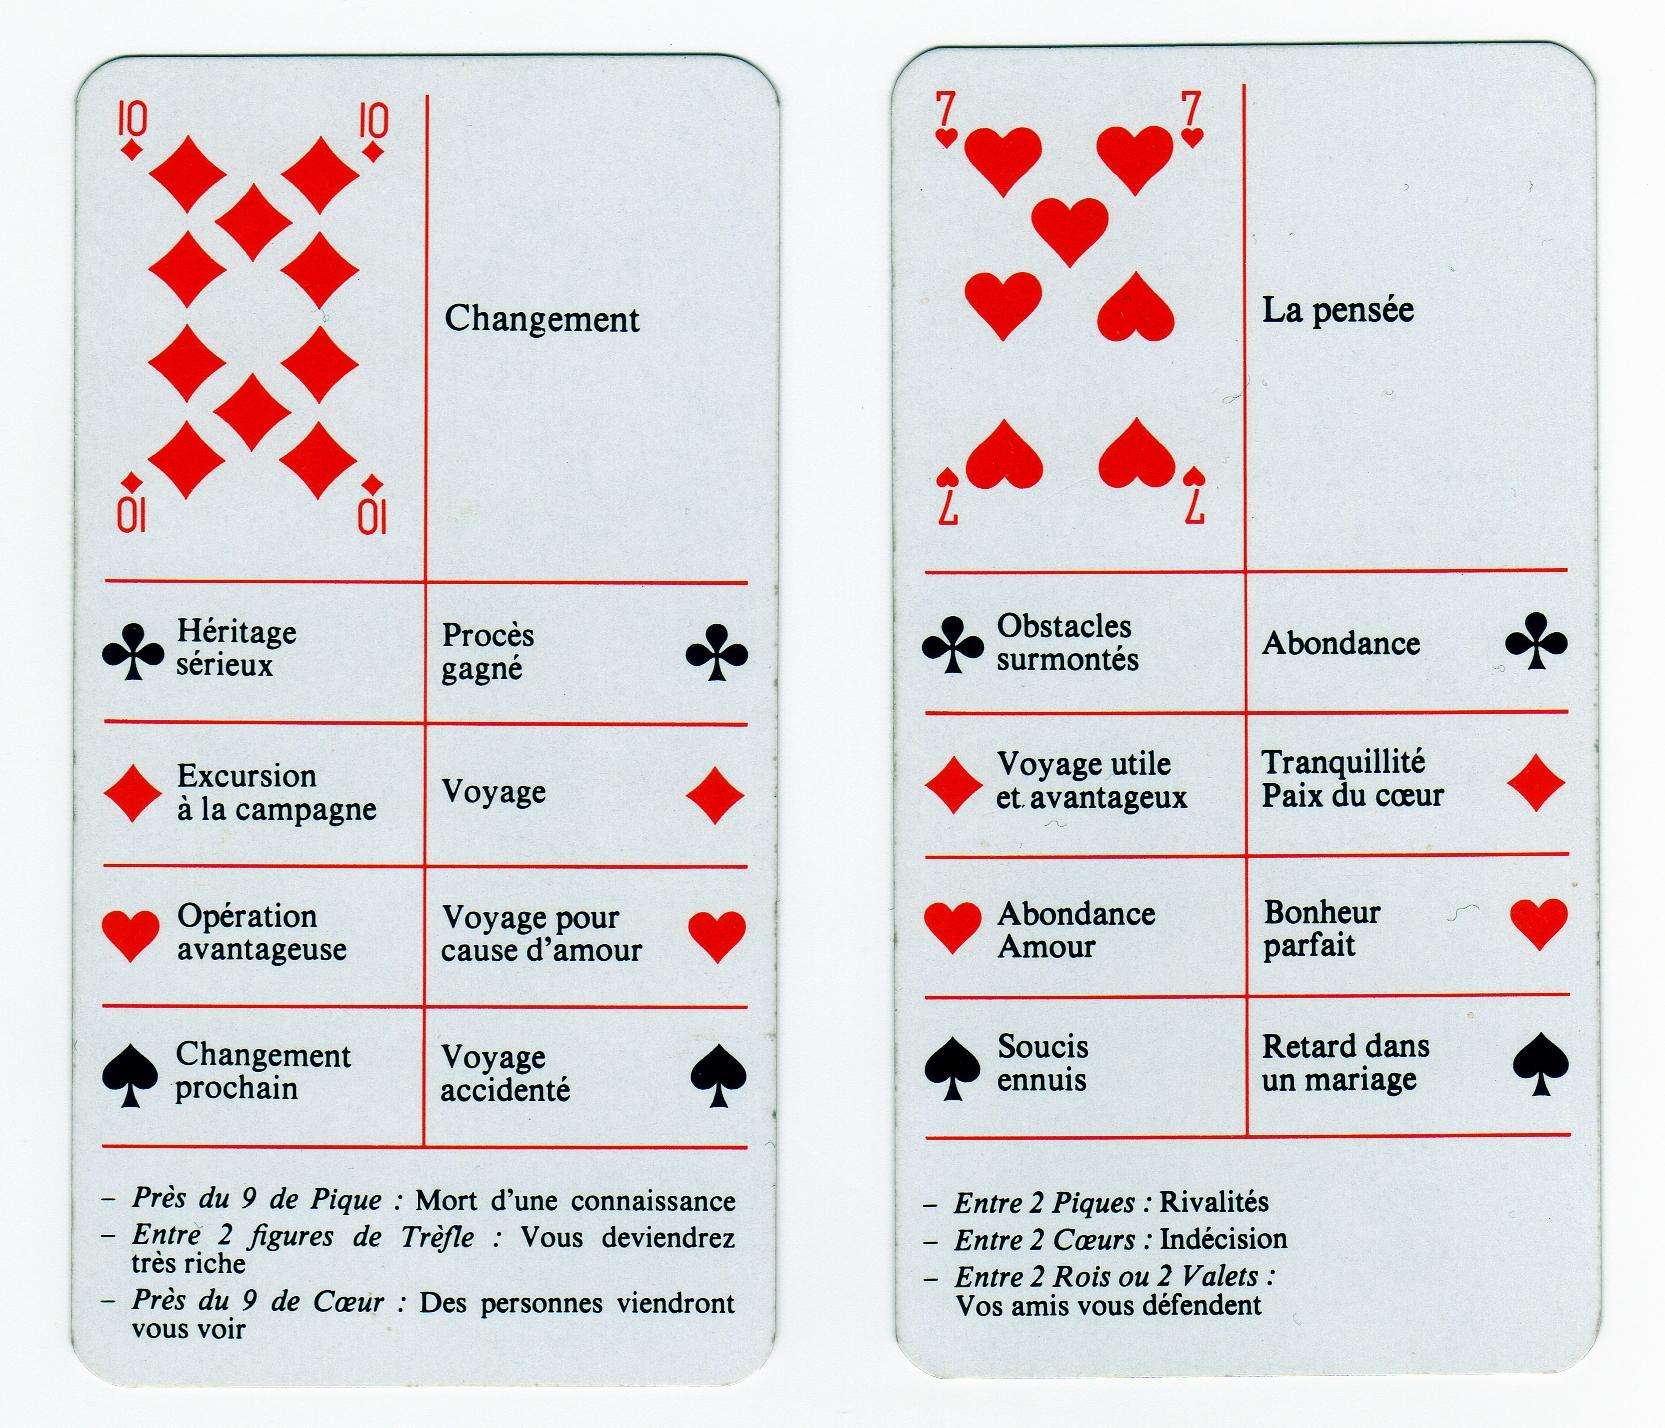 jeu de carte a 2 32 cartes Jeu Divinatoire 32 Cartes CARTOMANTIC Carte Livret